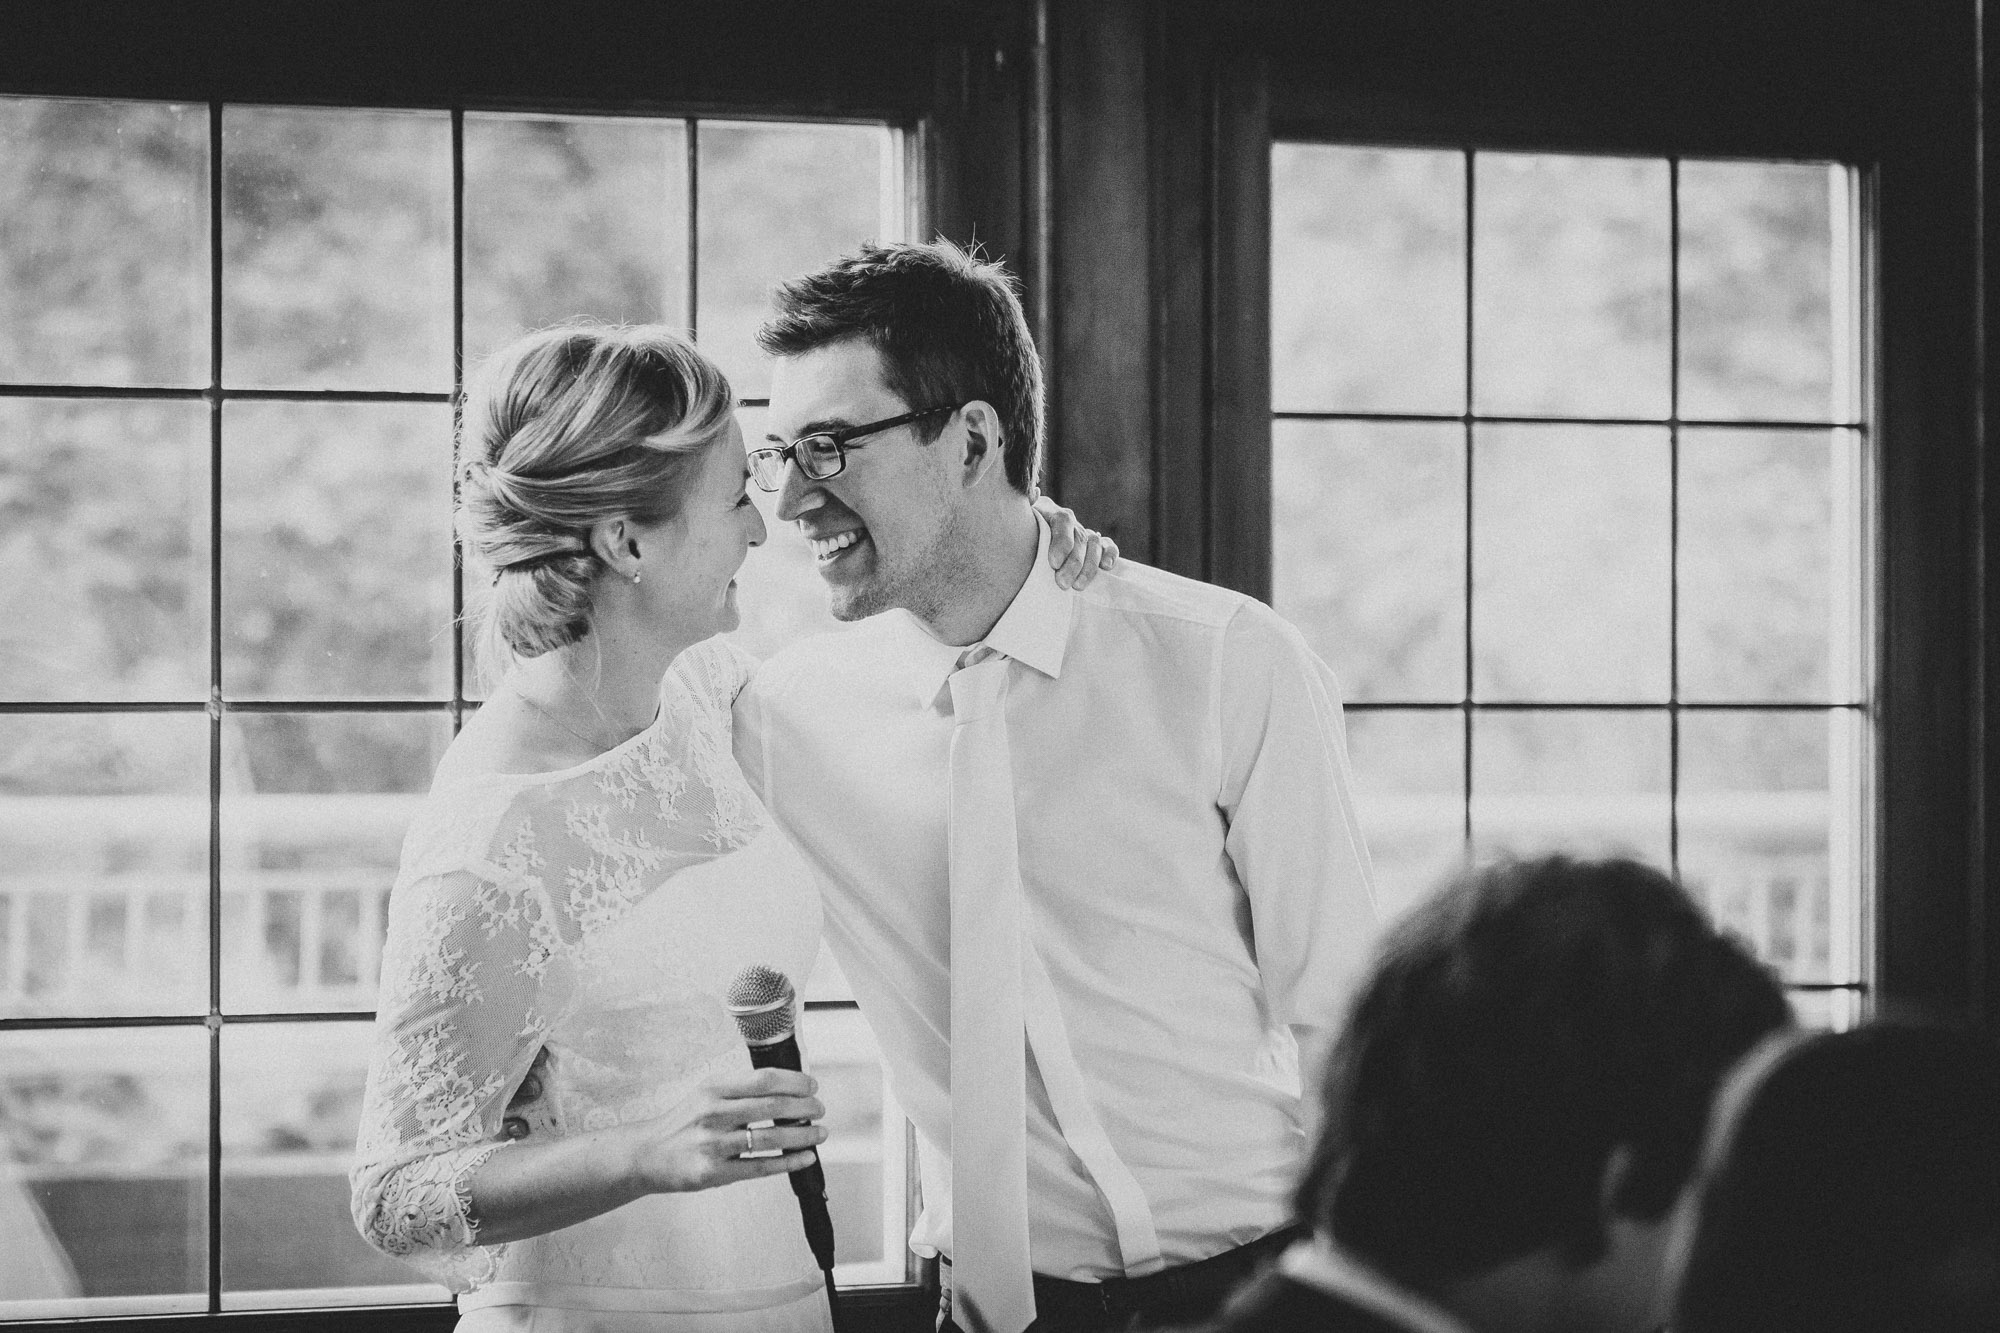 Hochzeitsfotografie-Tuebingen-Doro-Stefan-43